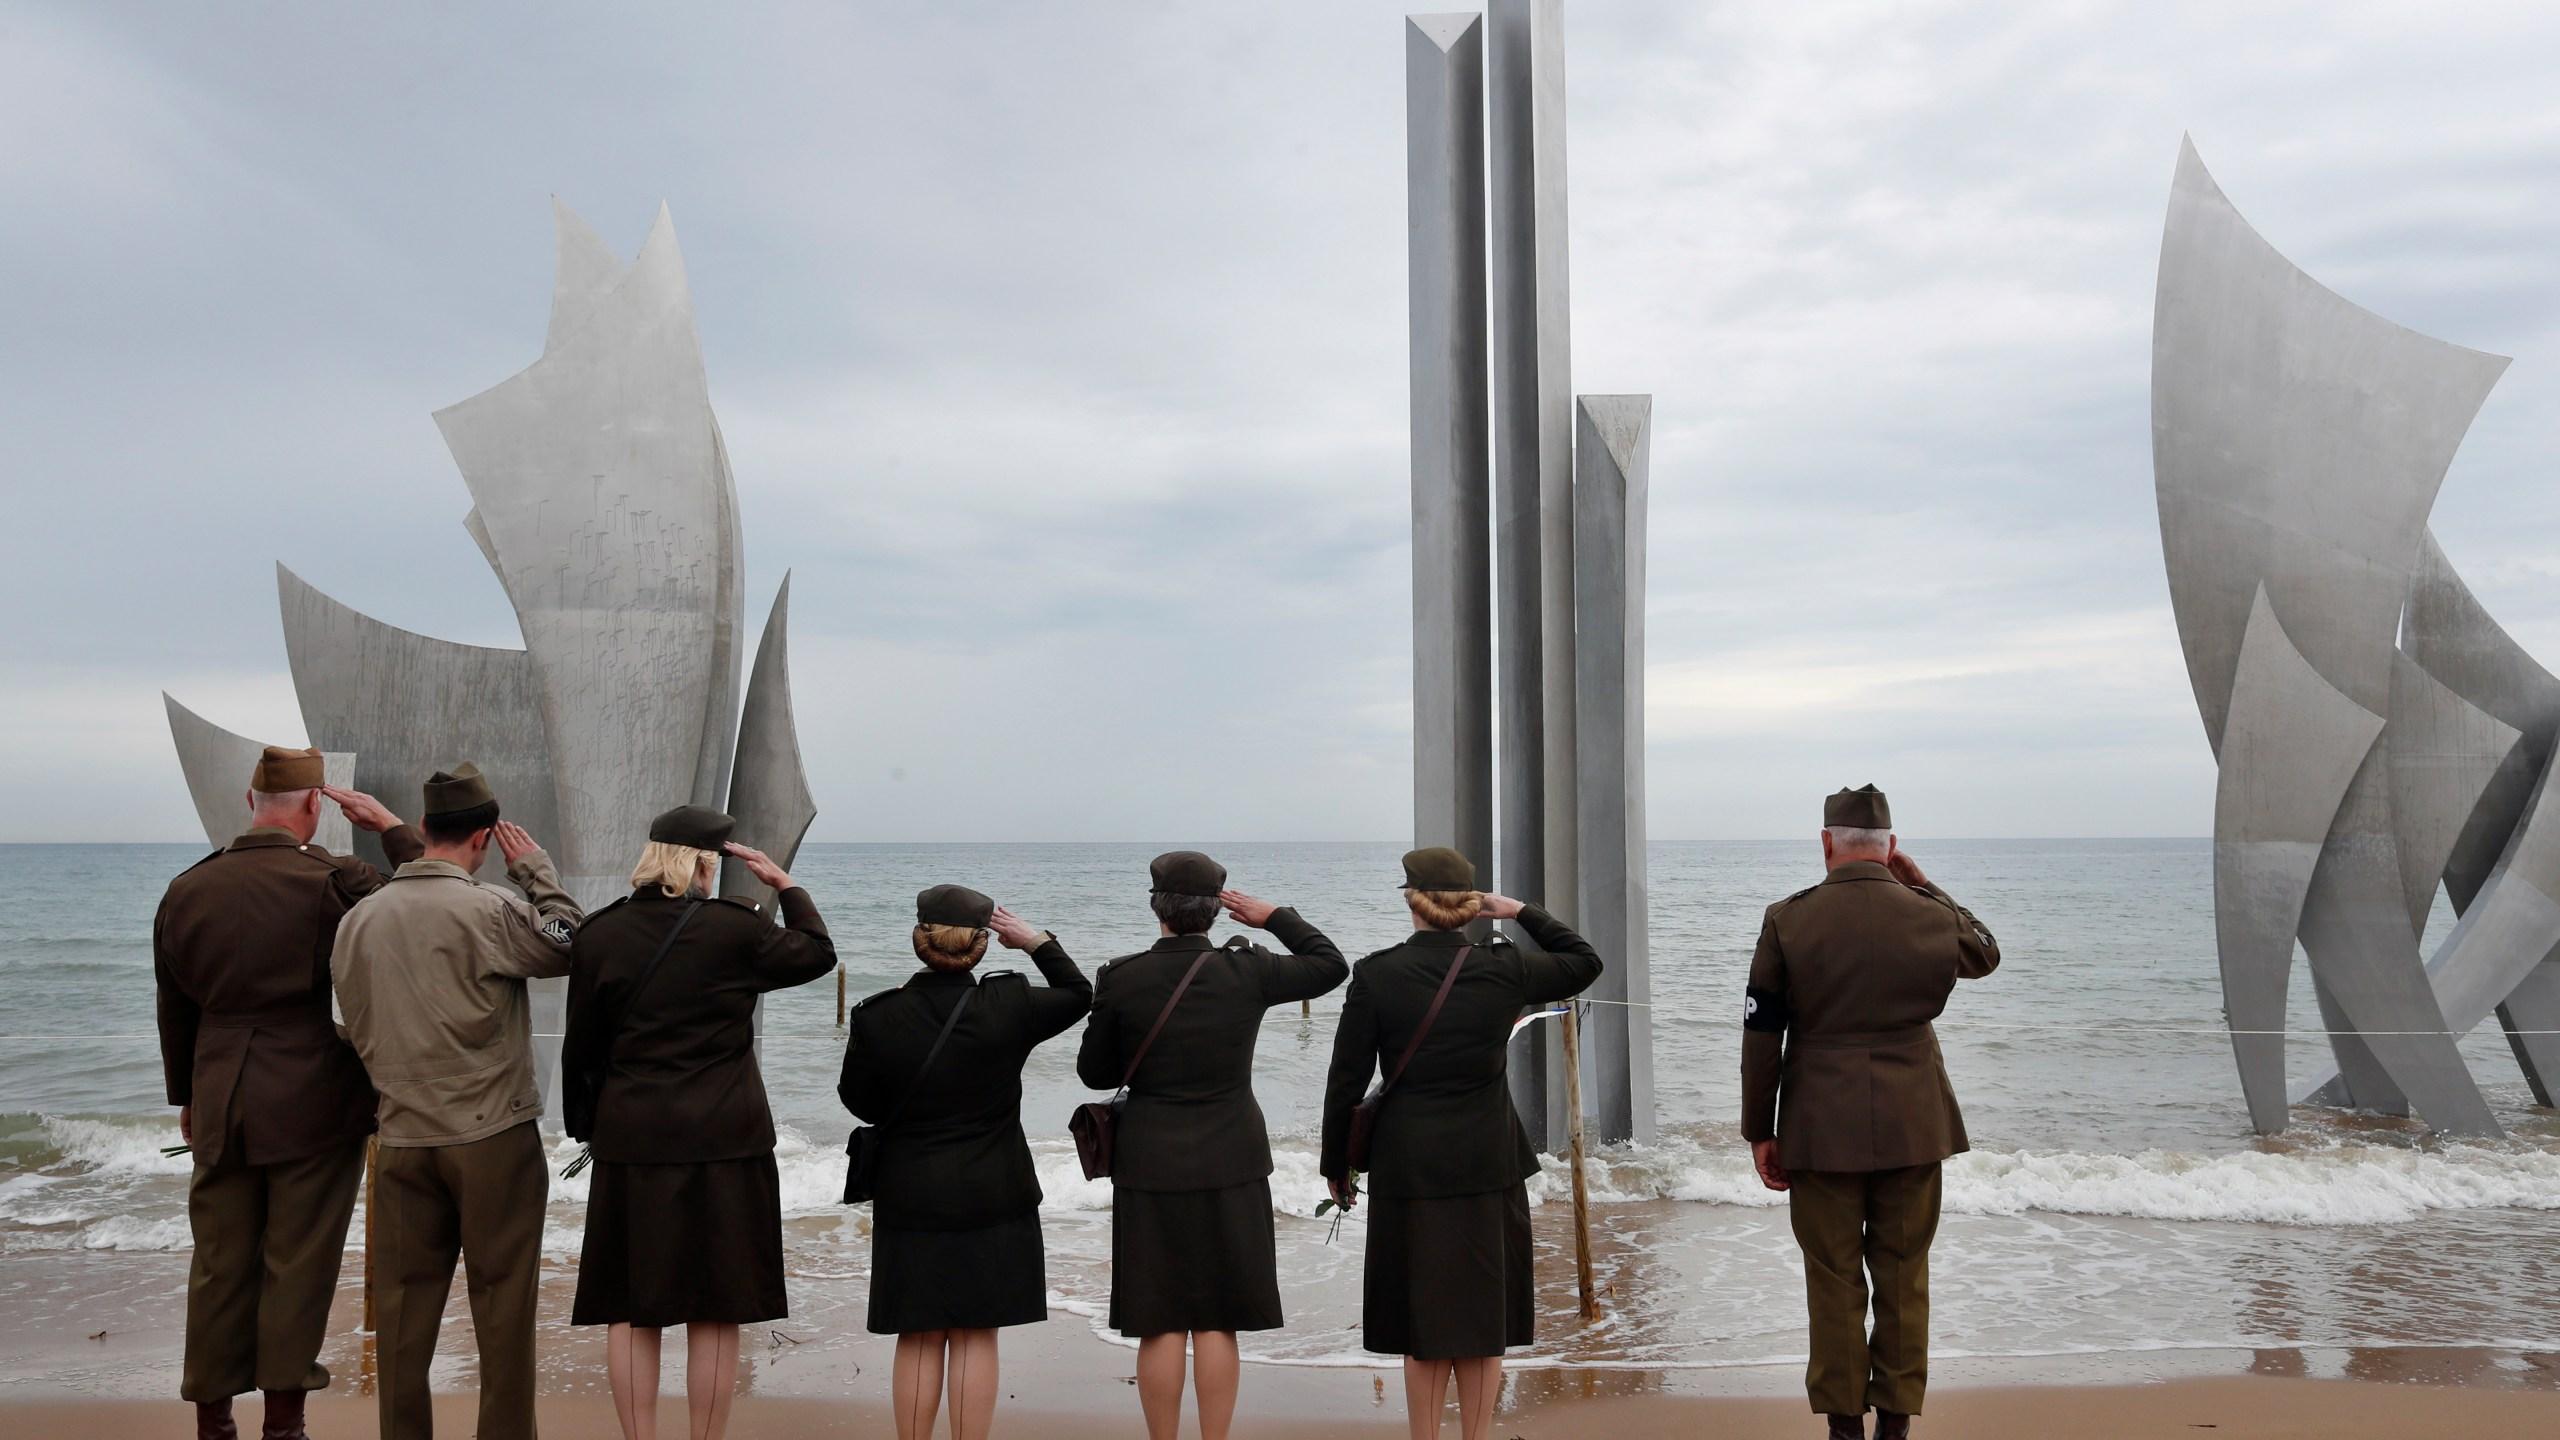 France_D-Day_Anniversary_77309-159532.jpg84312502